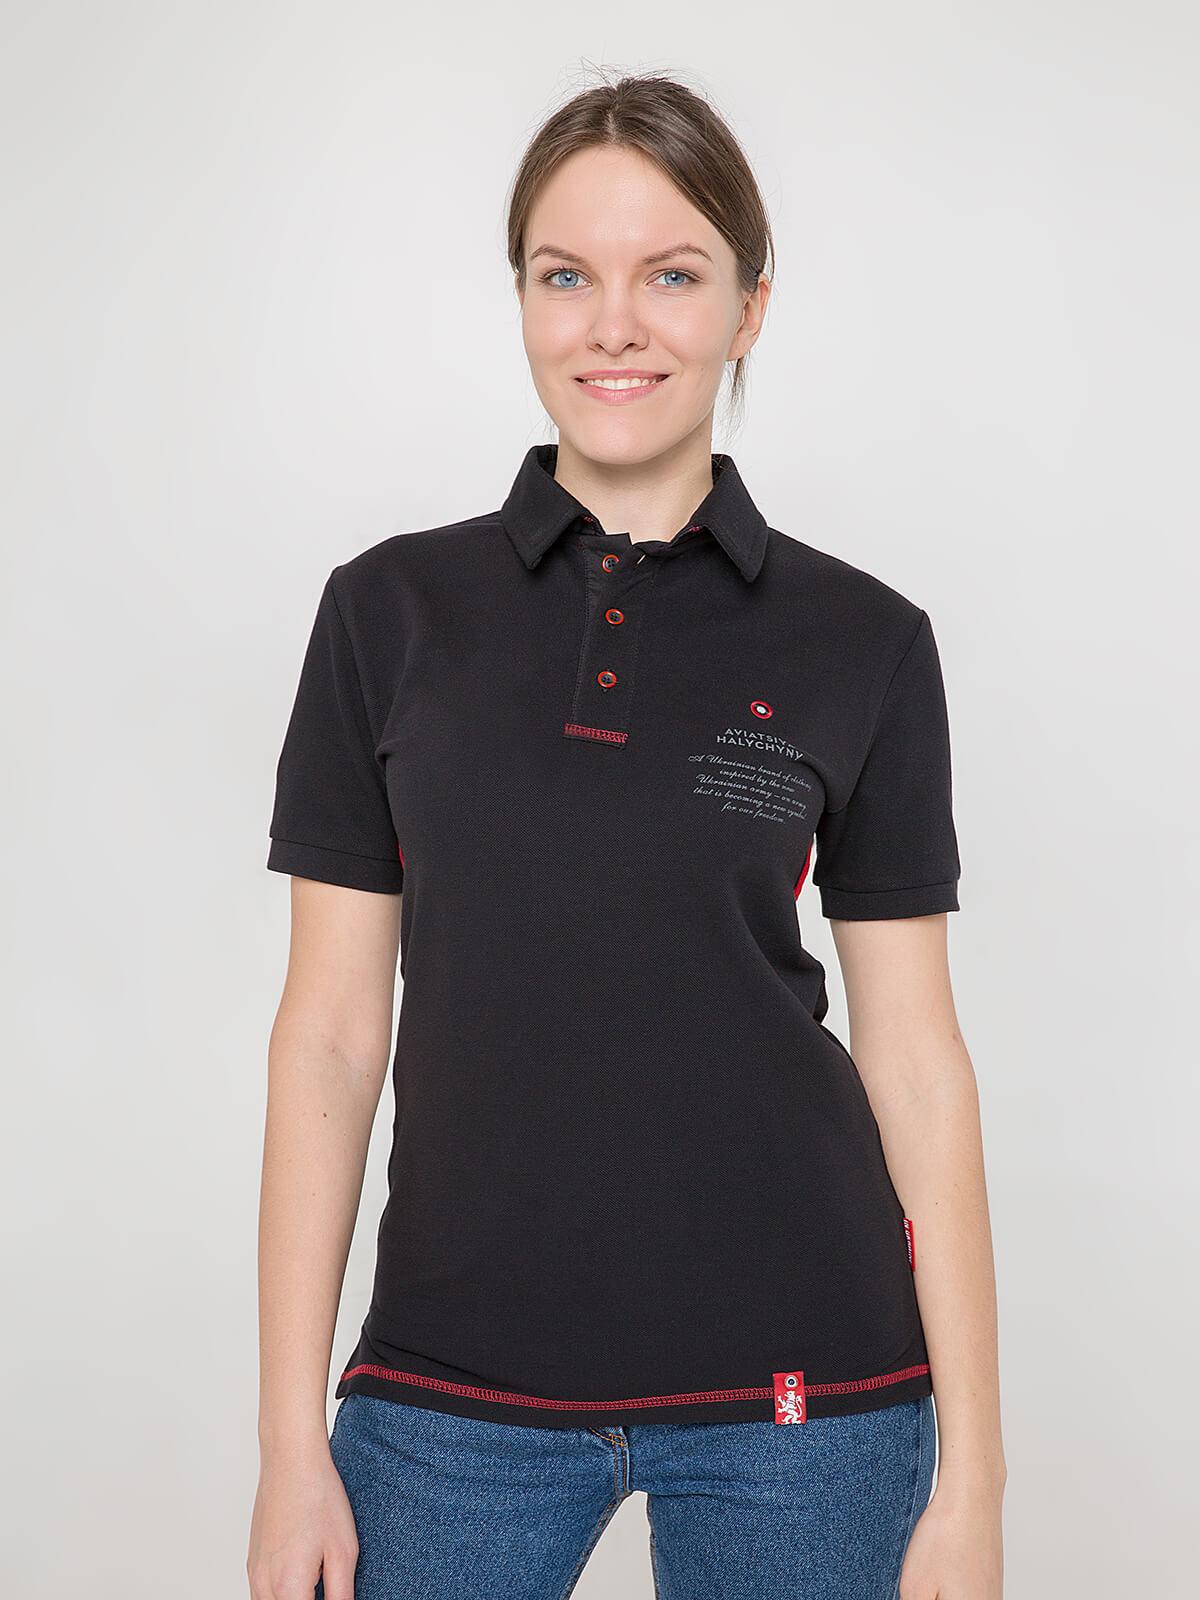 Women's Polo Shirt Wings. Color black. Unisex polo (men's sizes).